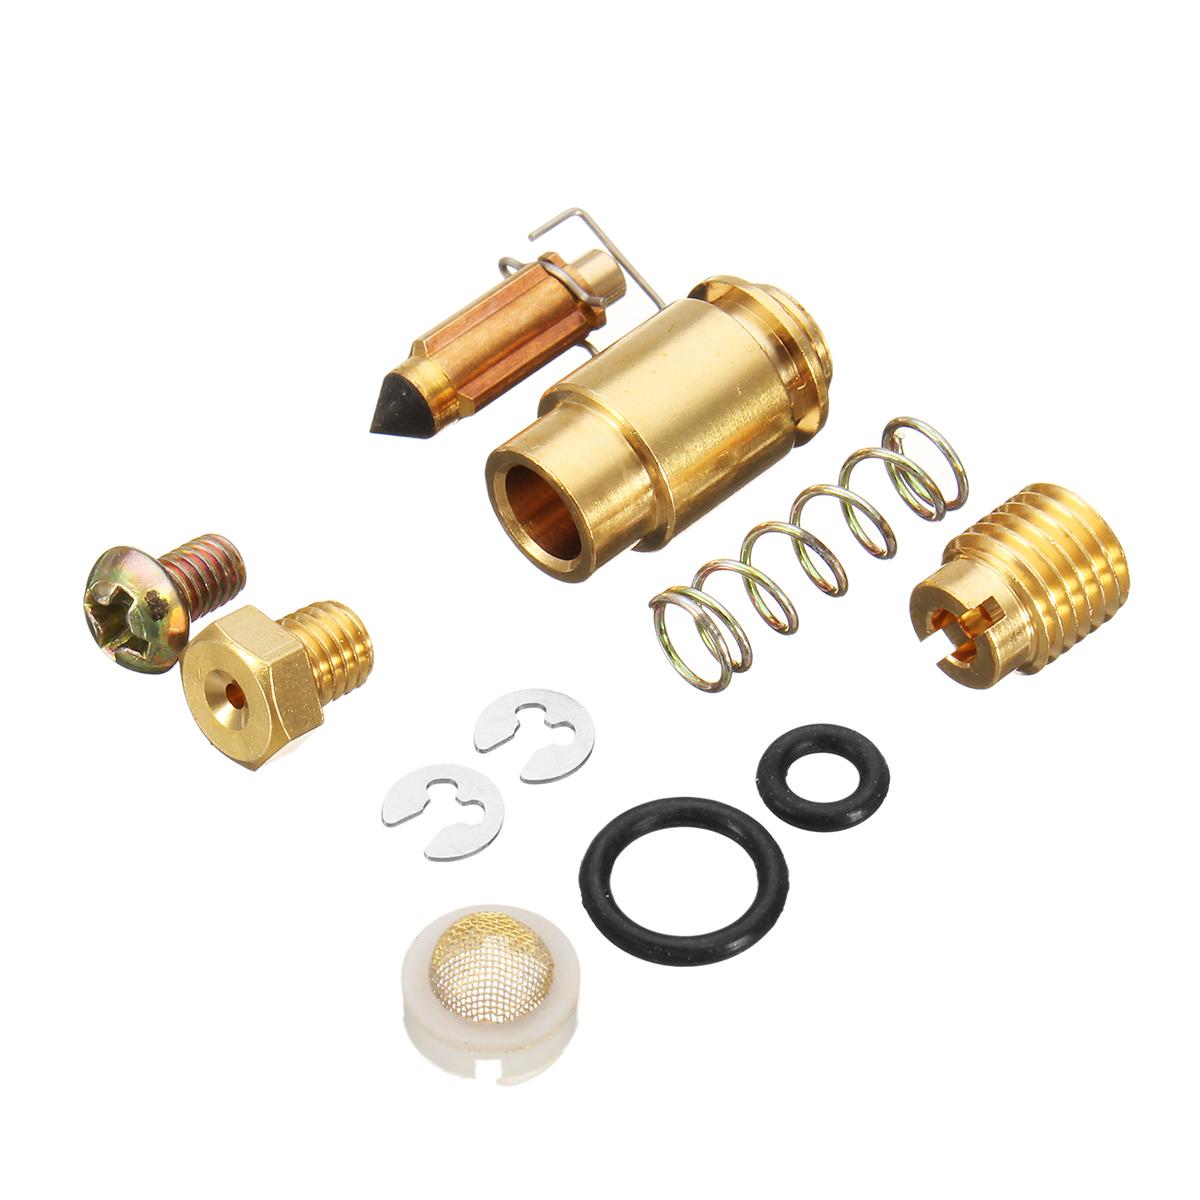 Carburatore Carb Repair Rebuild Kit per Yamaha XT600 XT600E XT600K 3TB 90-92